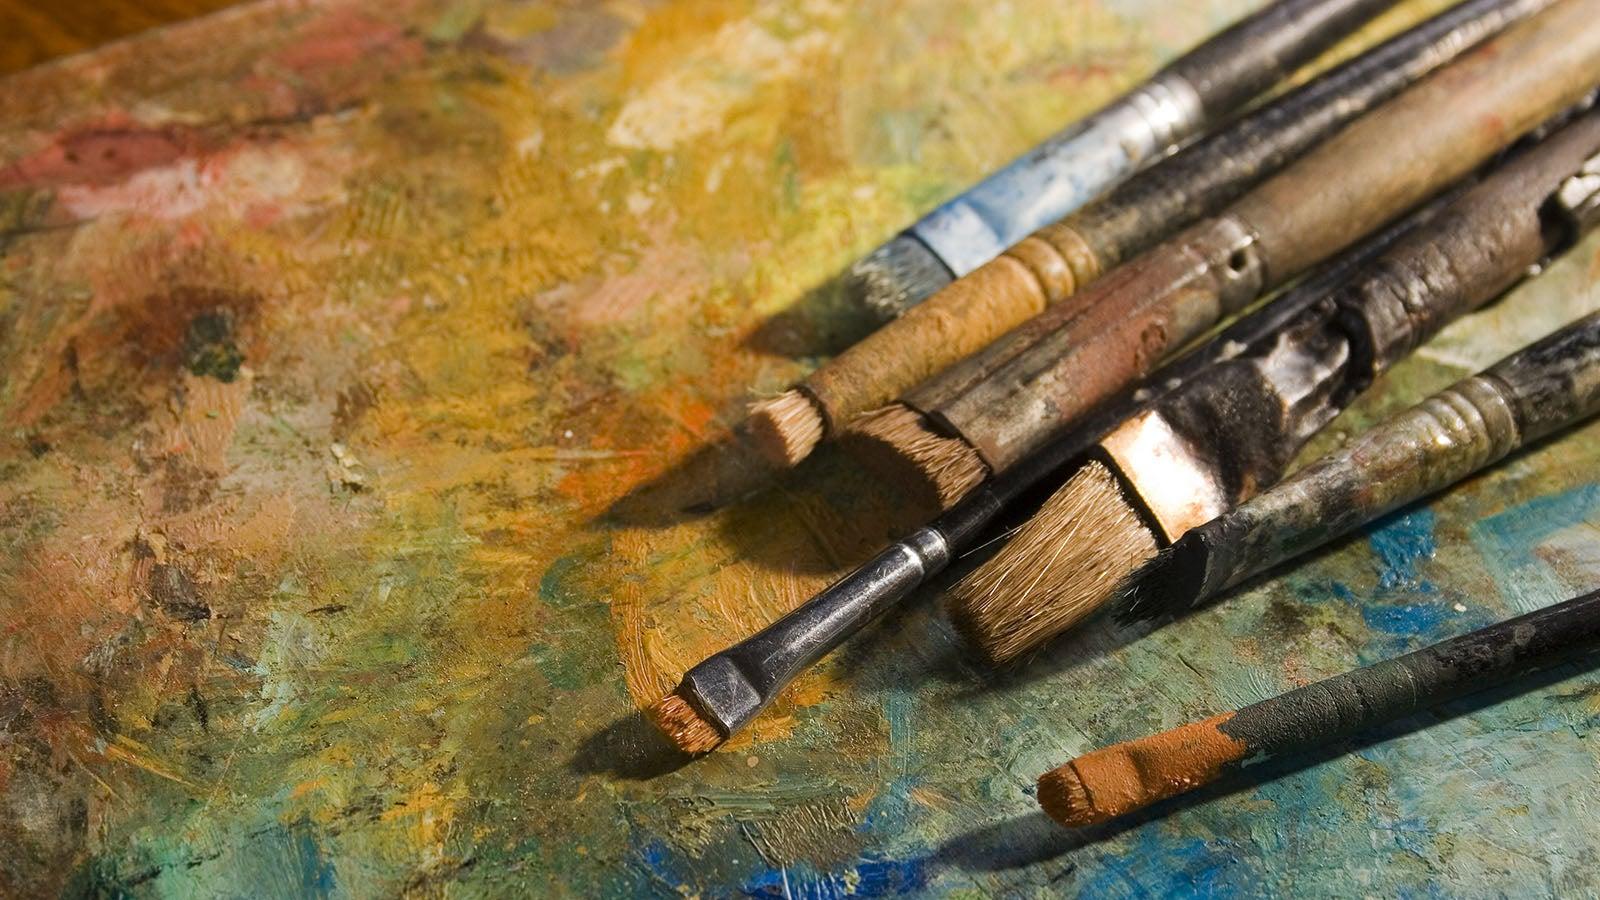 Paintbrushes on painting